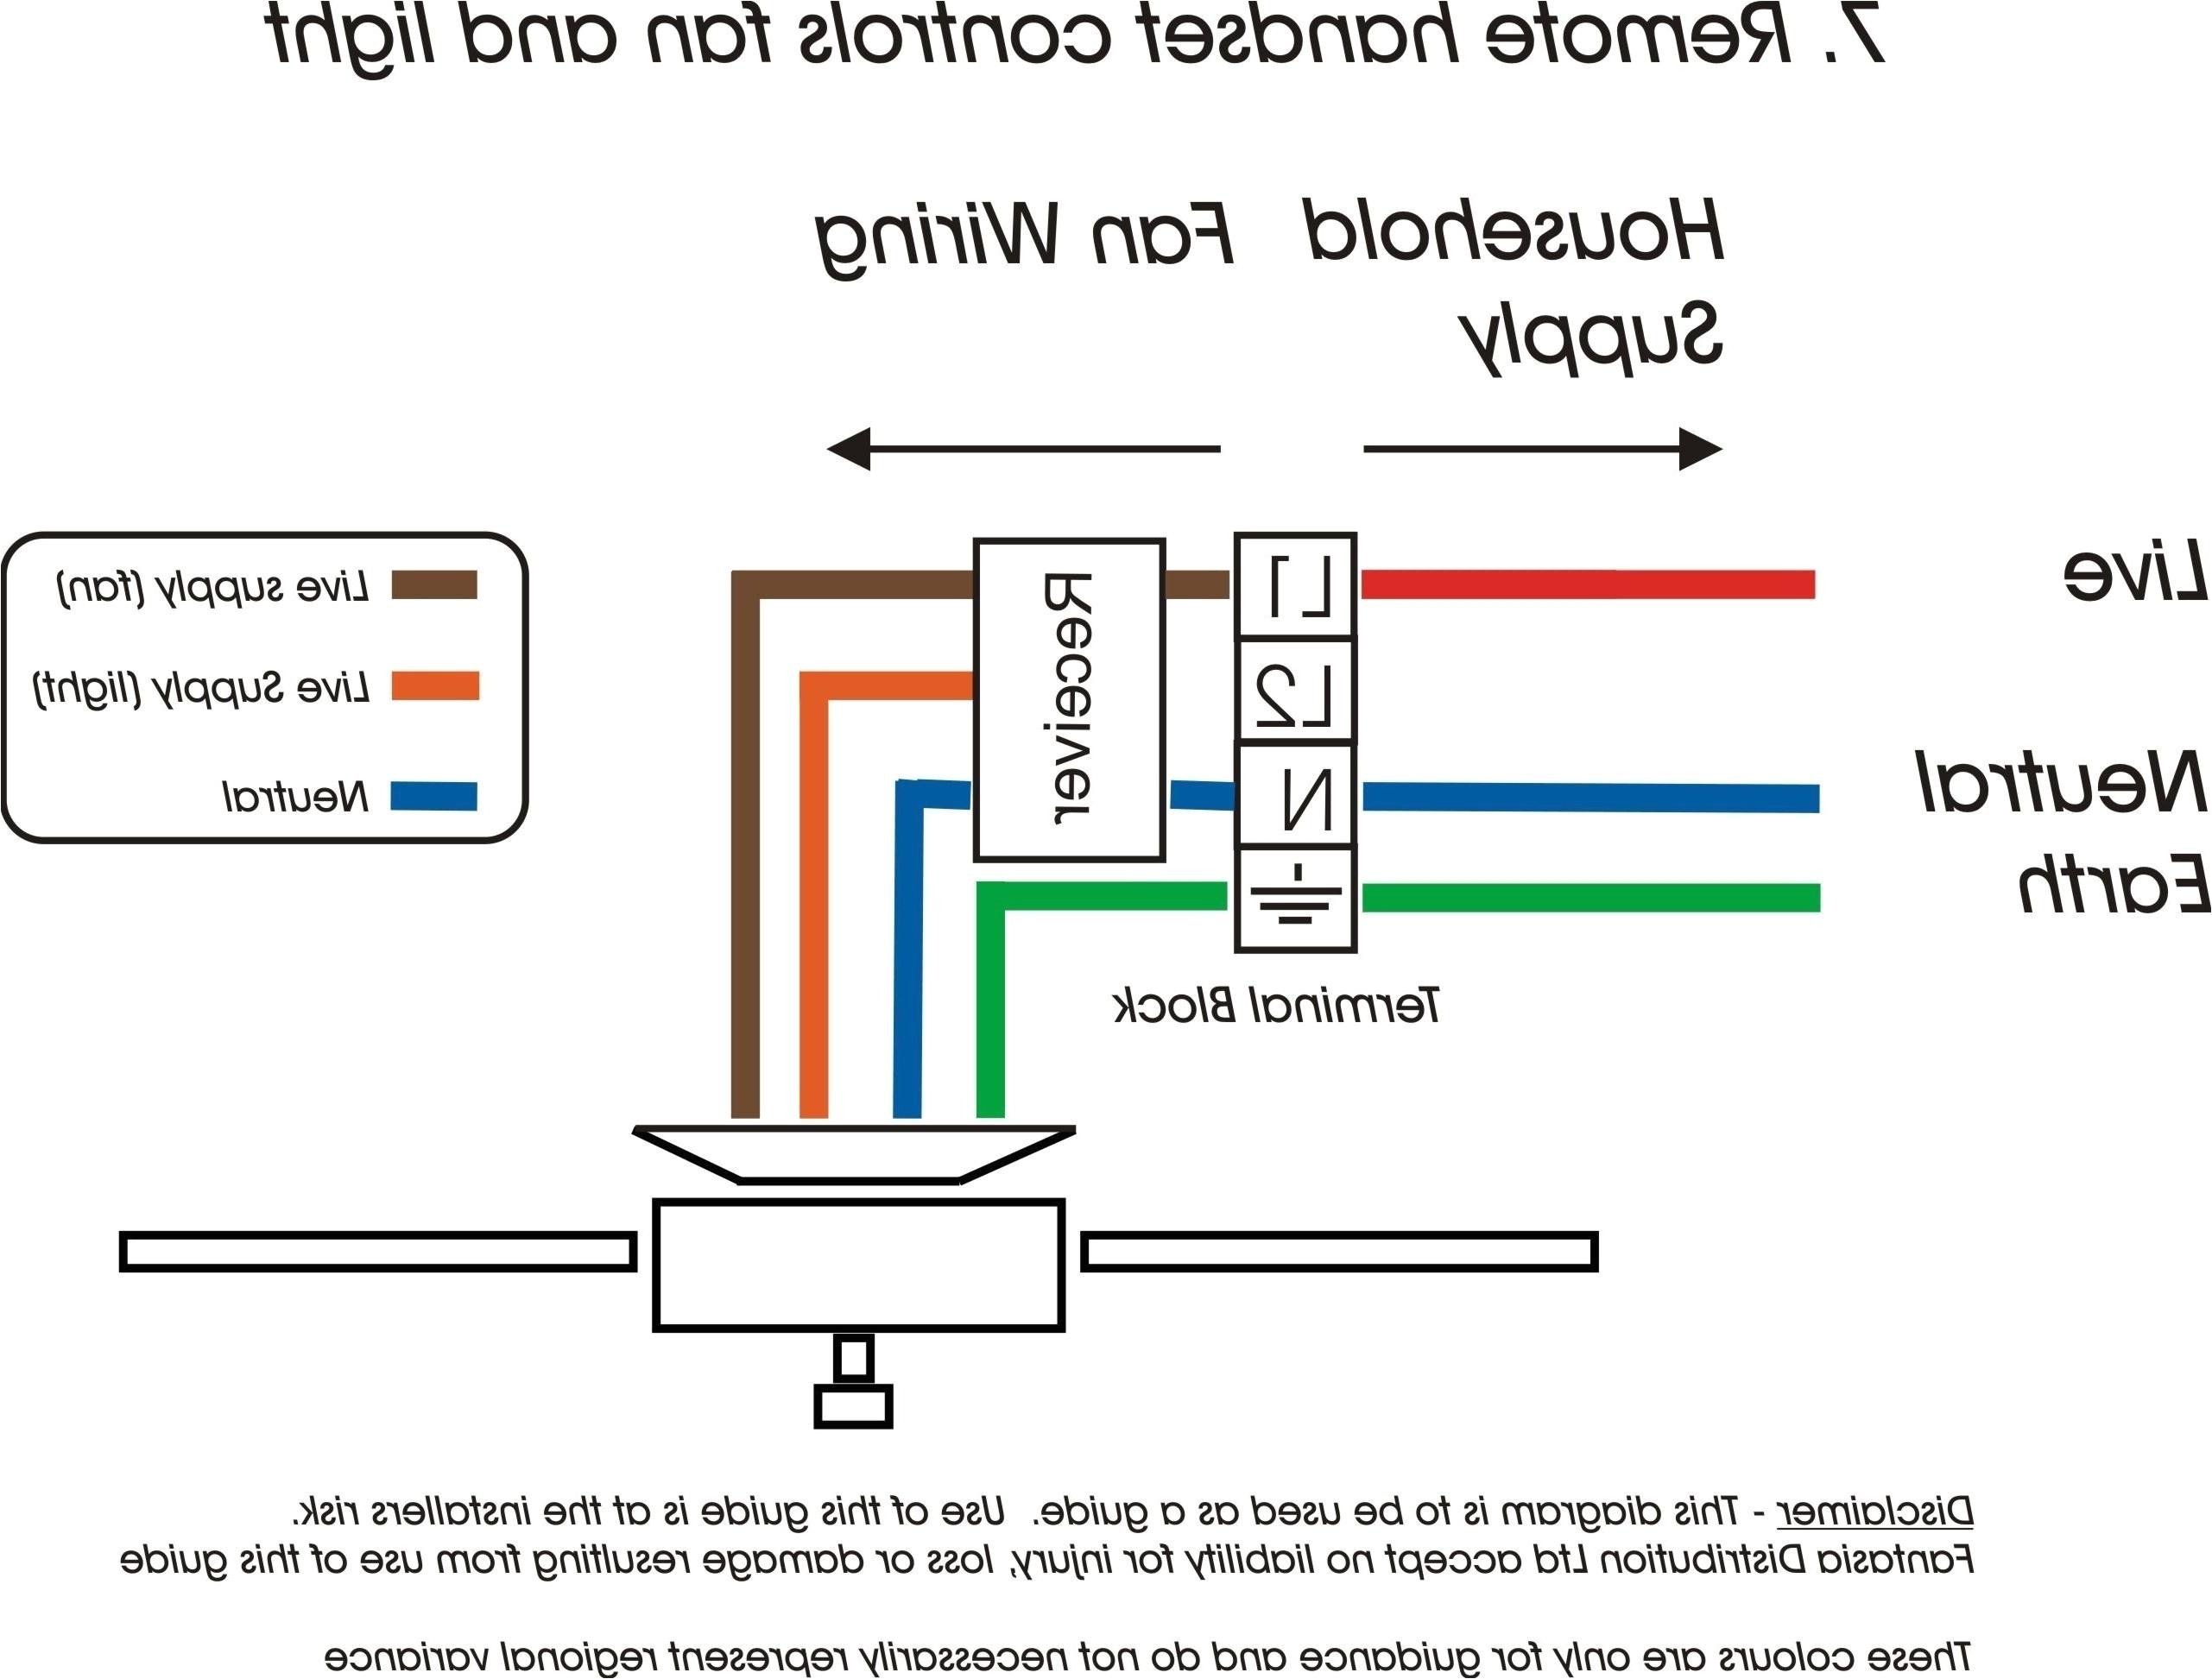 reese brakeman compact wiring diagram fresh for pdl light switch amp gewiss of jpg